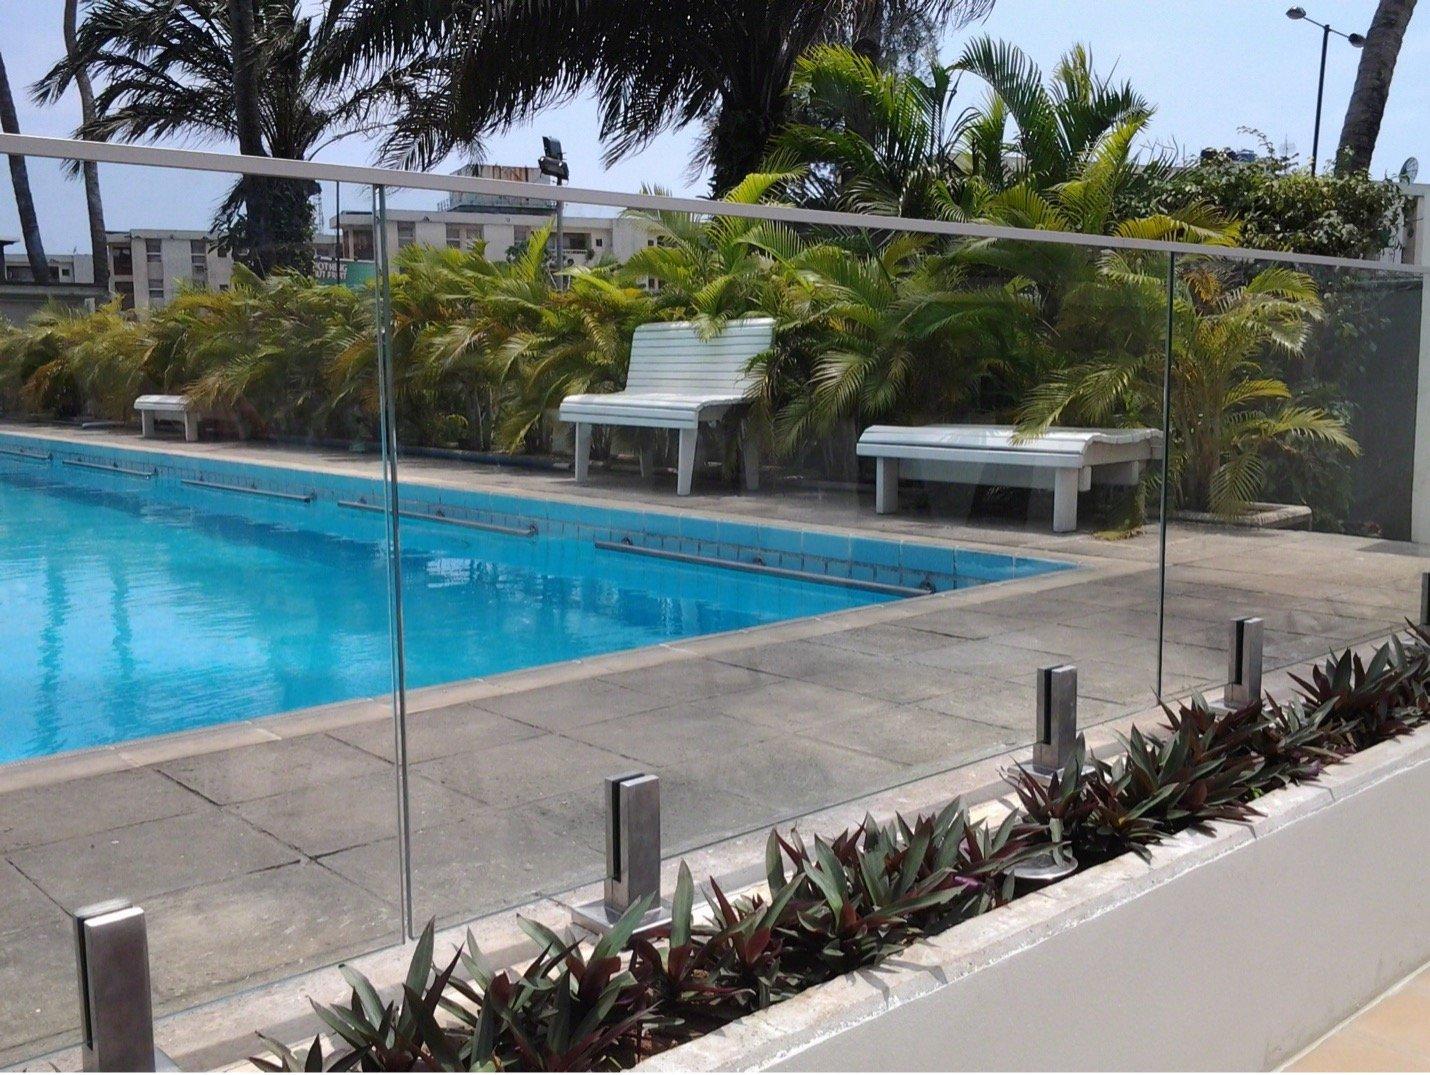 Glass railing around outdoor pool